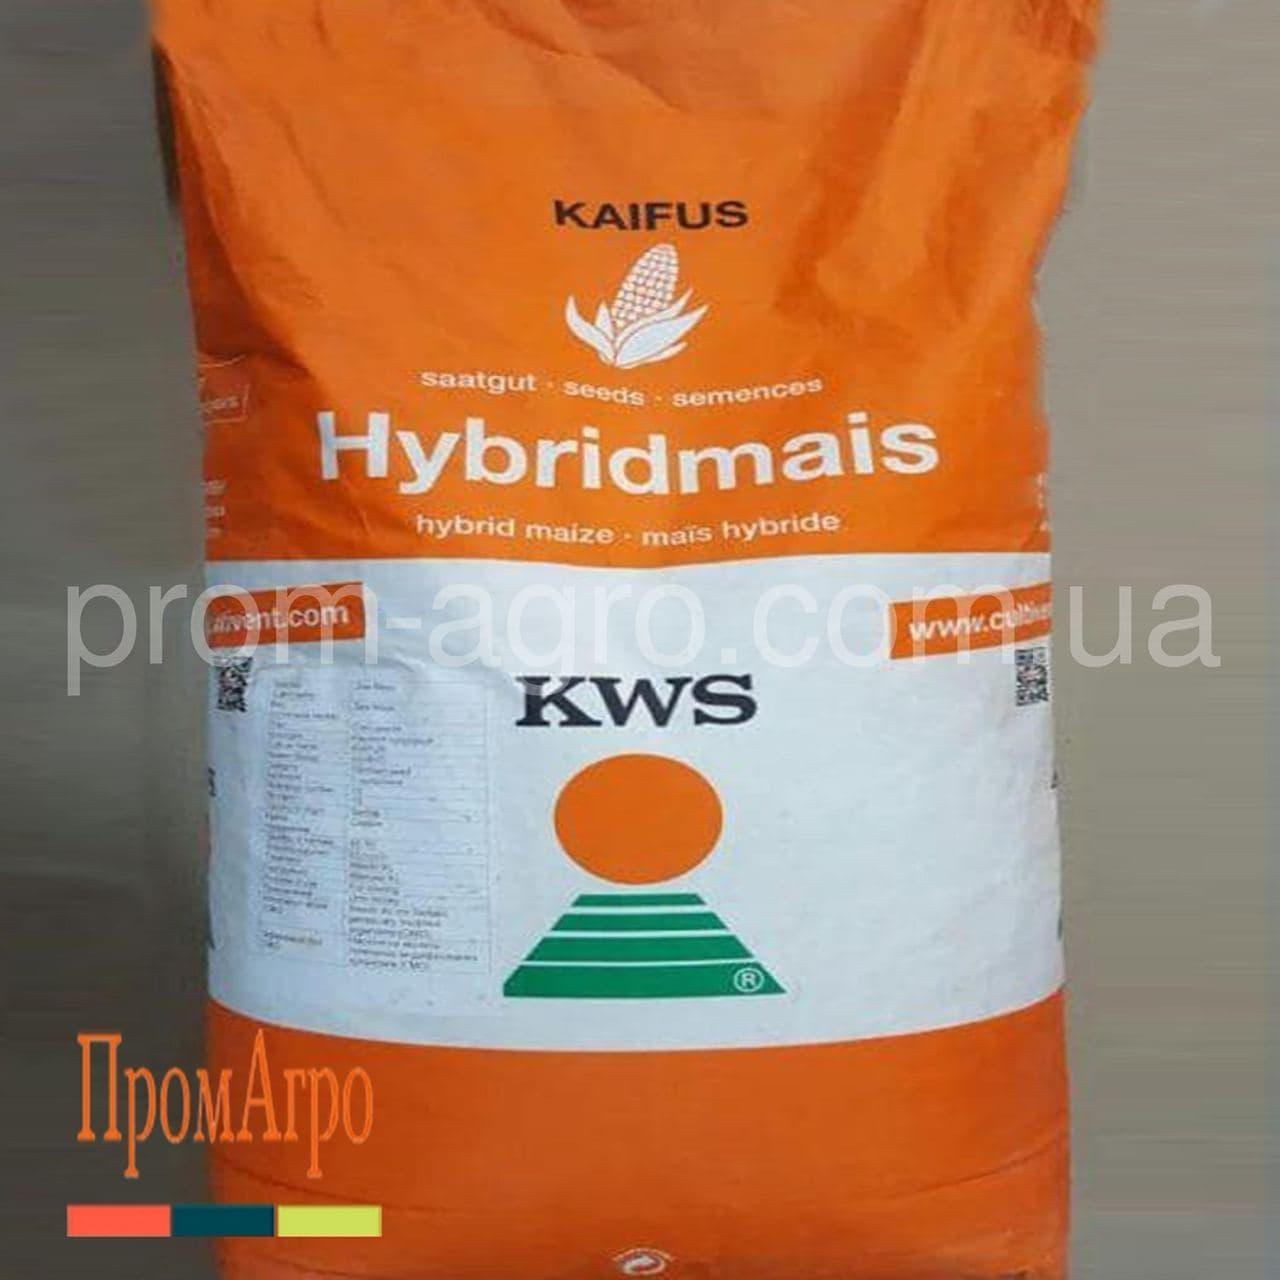 Семена кукурузы KWS Карифолс ФАО 380 посевной гибрид кукурузы КВС Карифолс